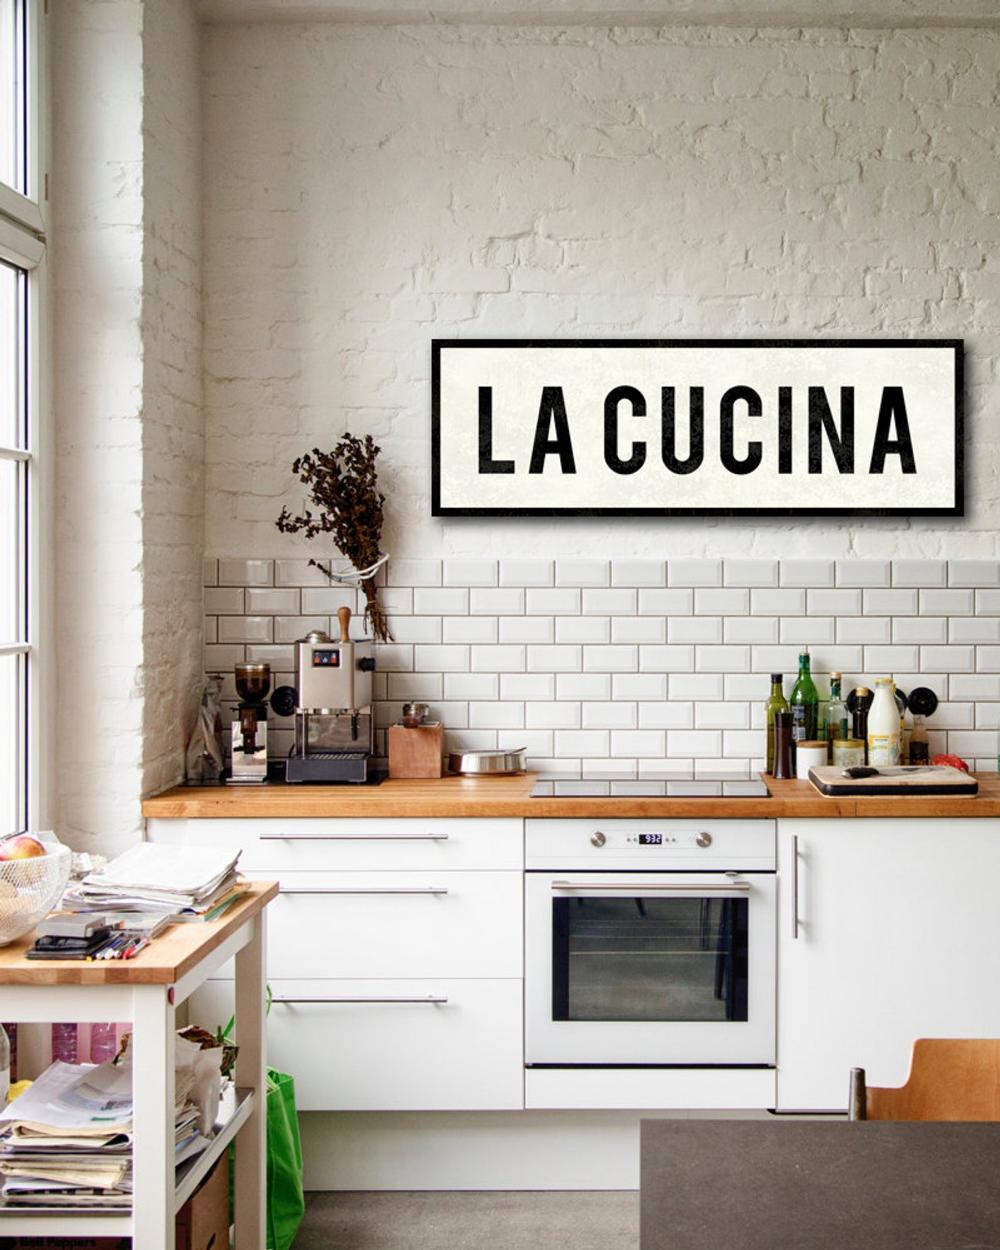 La Cucina Sign Kitchen Sign Italian Kitchen Decor Tuscan Etsy Italian Kitchen Decor Home Decor Kitchen Tuscan Kitchen